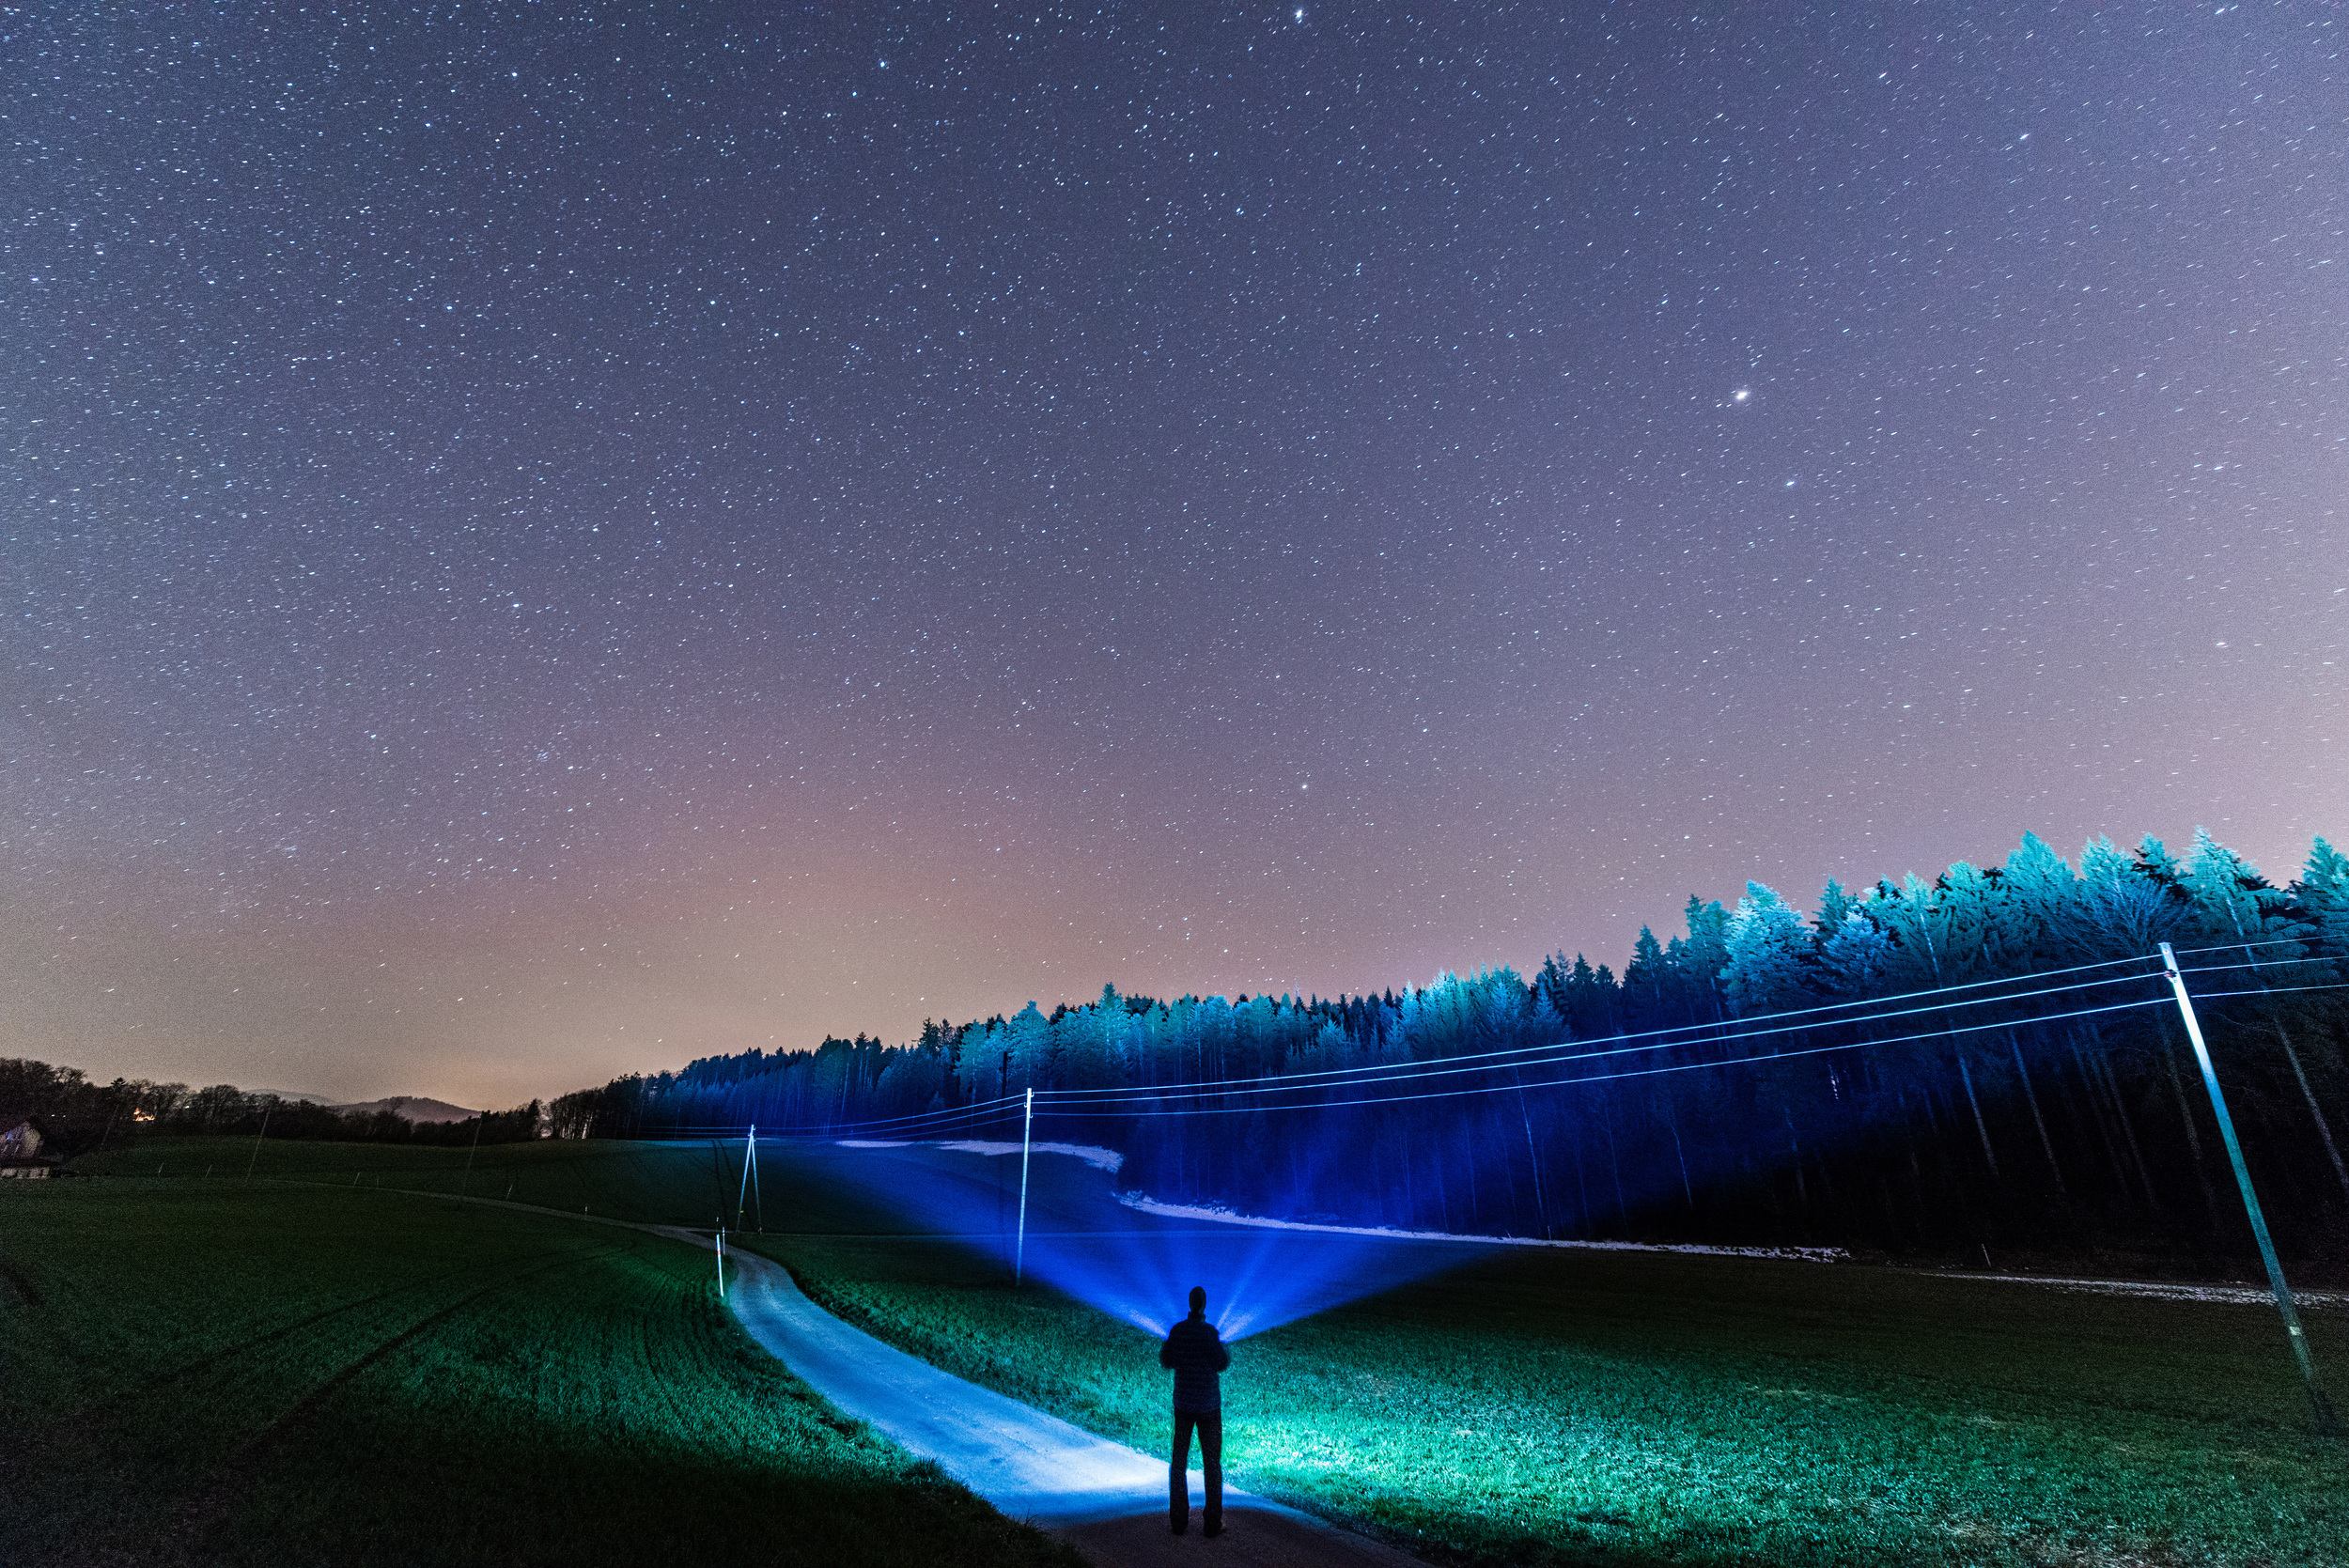 2014 03 28 Sterne Dentenberg kleiner.jpg